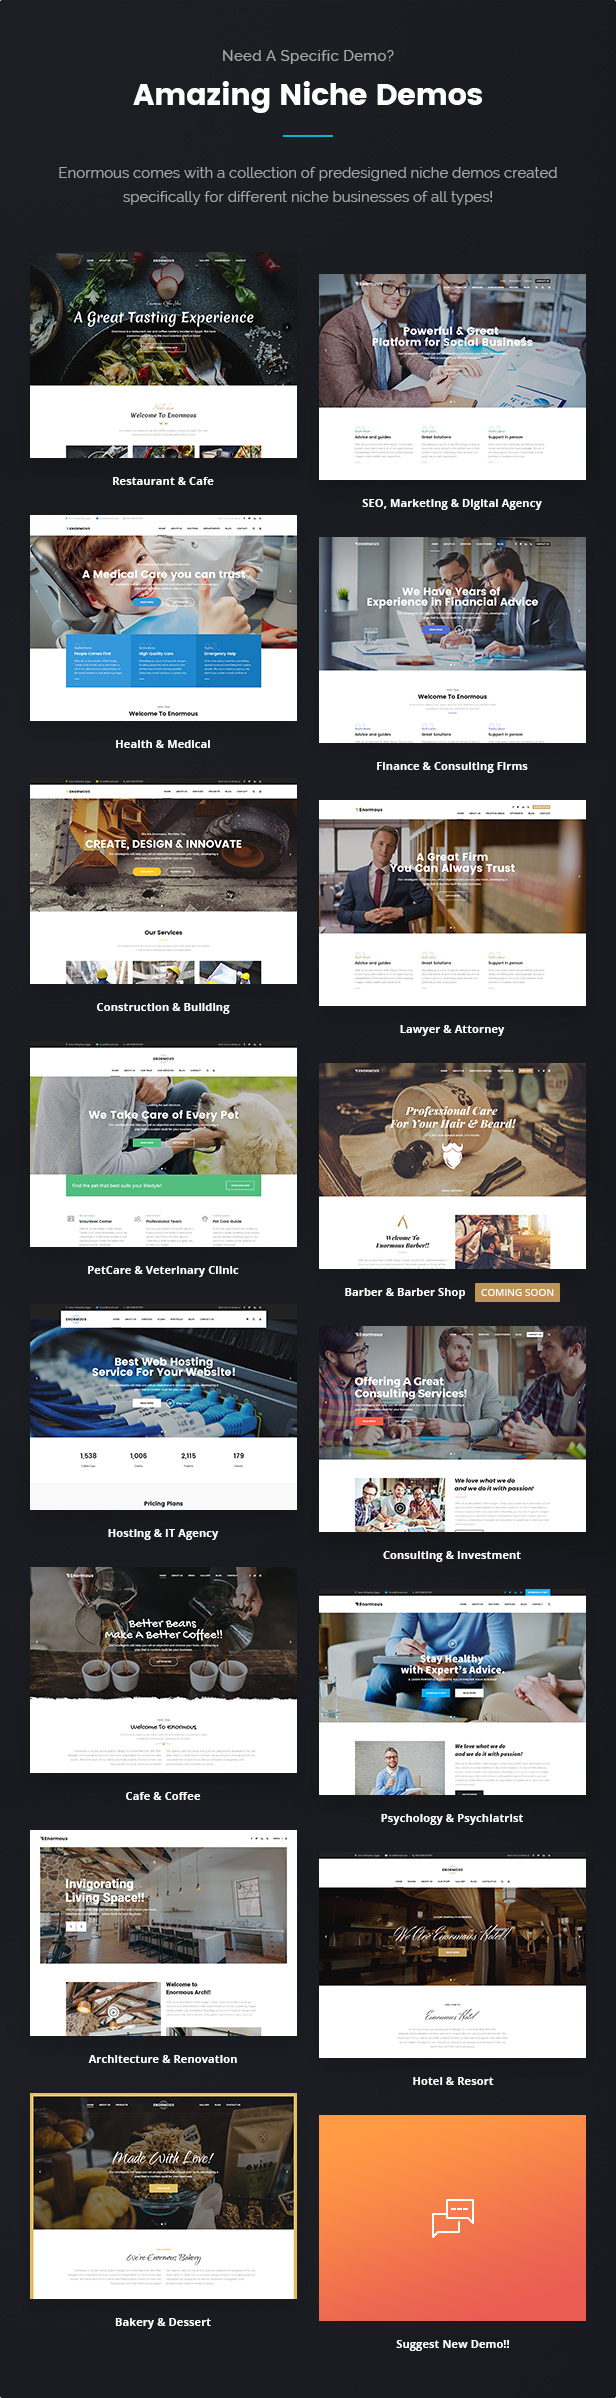 Enormous - Responsive Multi-Purpose HTML5 Template - 7